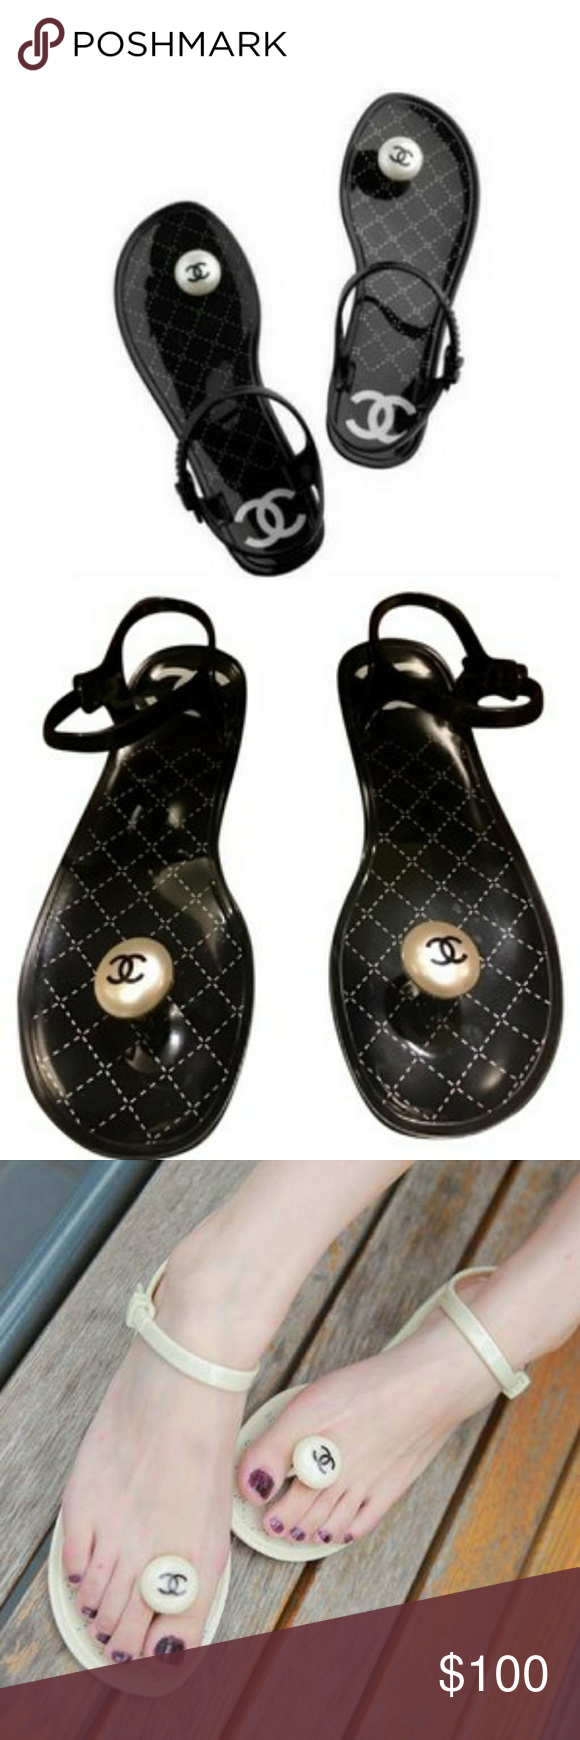 b9f4c4ee7cca Chanel thong sandals Chanel mushroom thong sandals cc Shoes Flats   Loafers